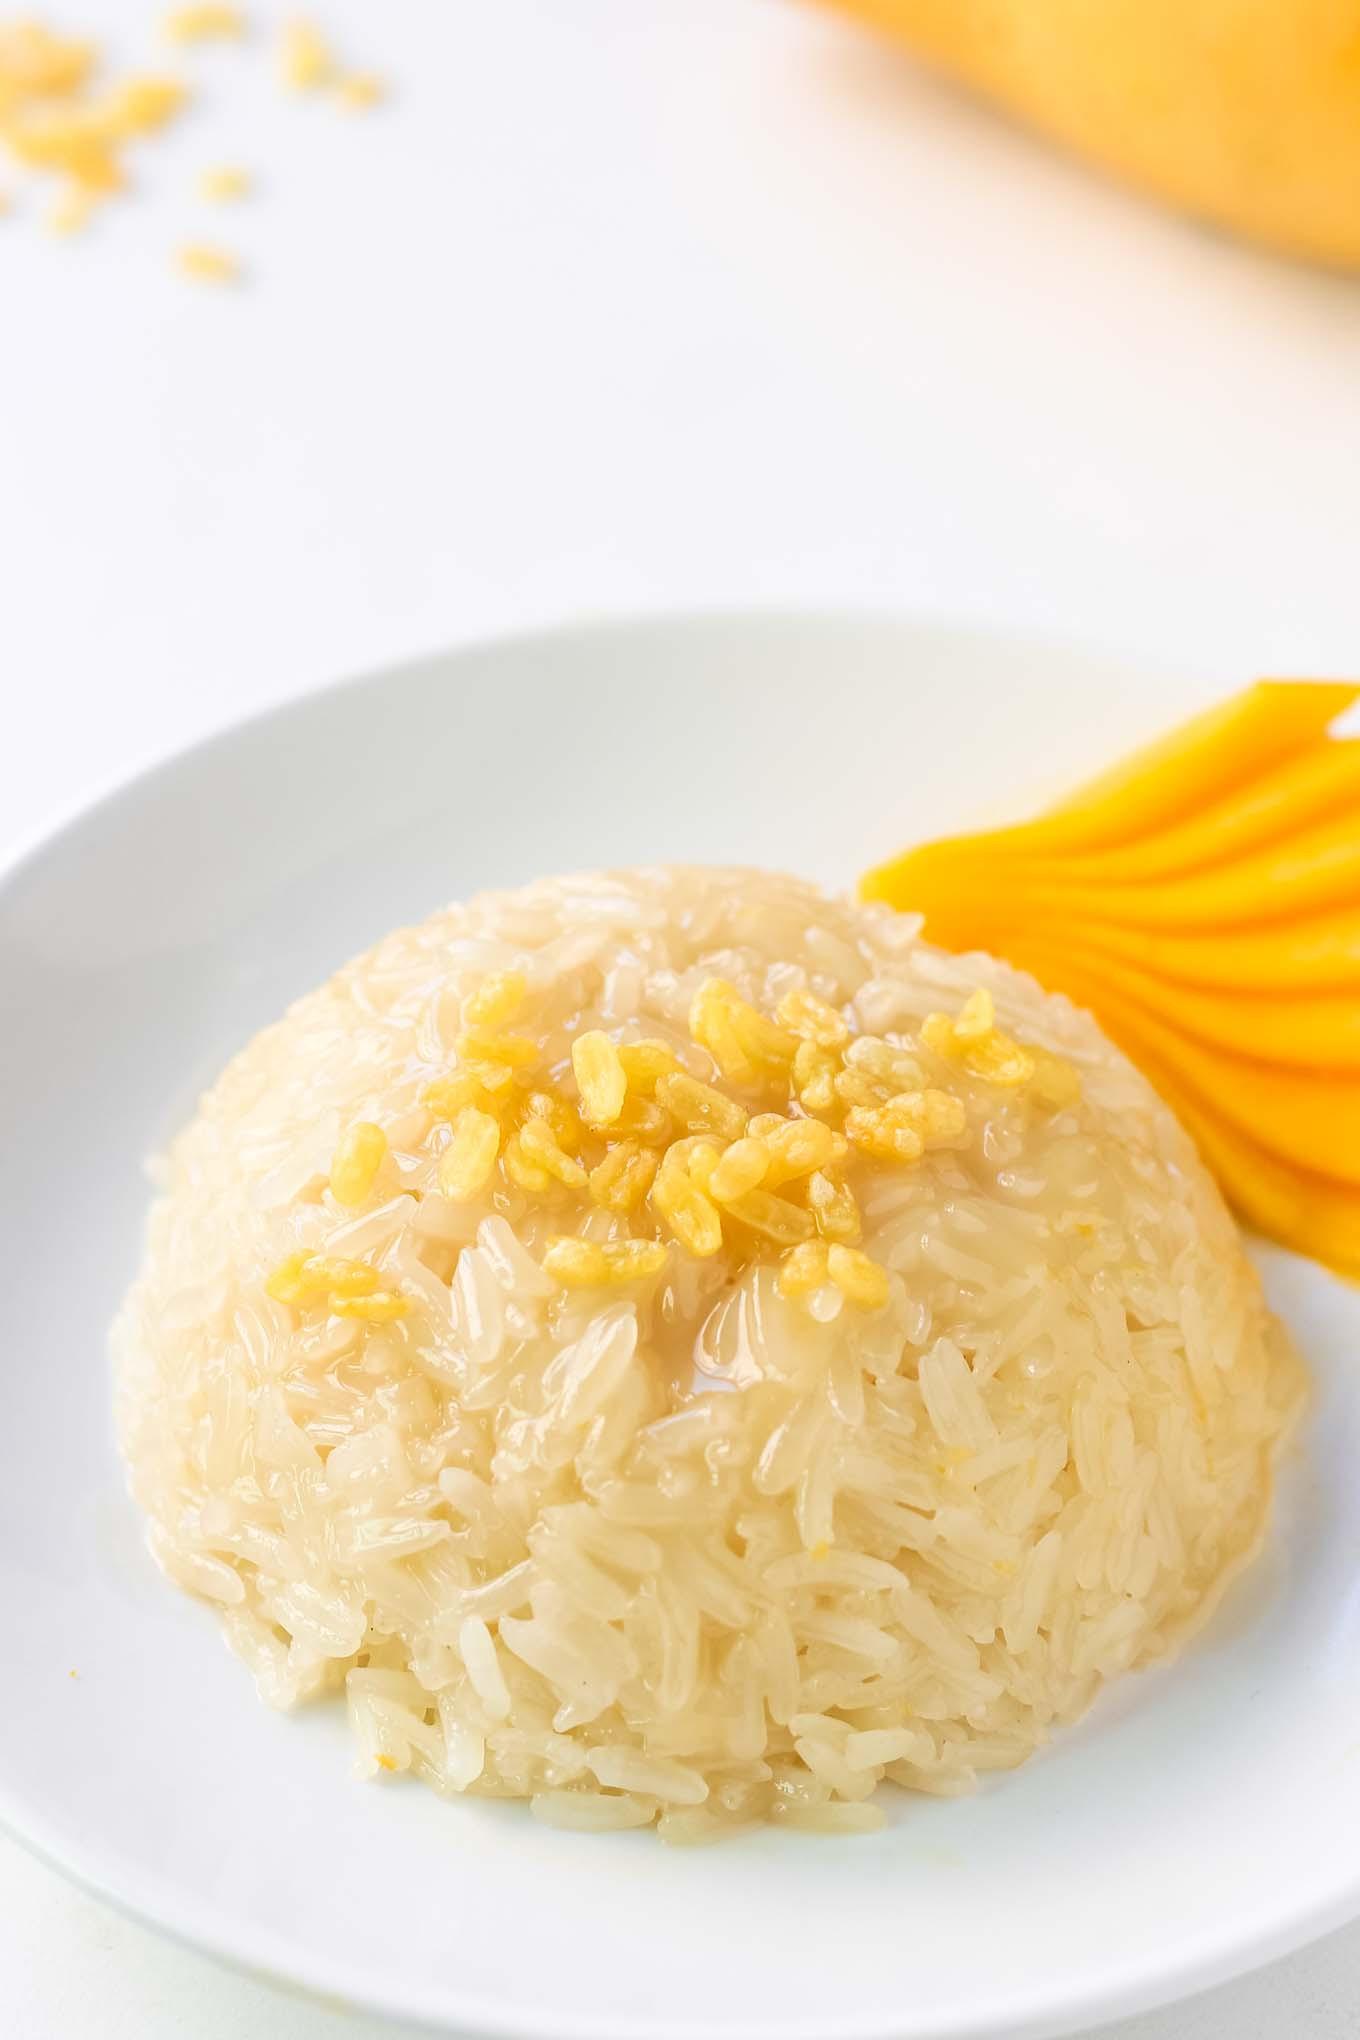 Thai Dessert Recipe  Thai Mango Sticky Rice Dessert Recipe – LeelaLicious